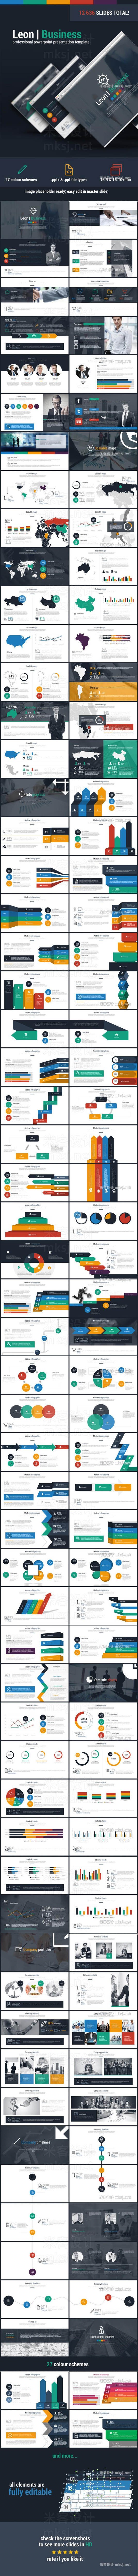 PPT模板 leon business powerpoint presentation template